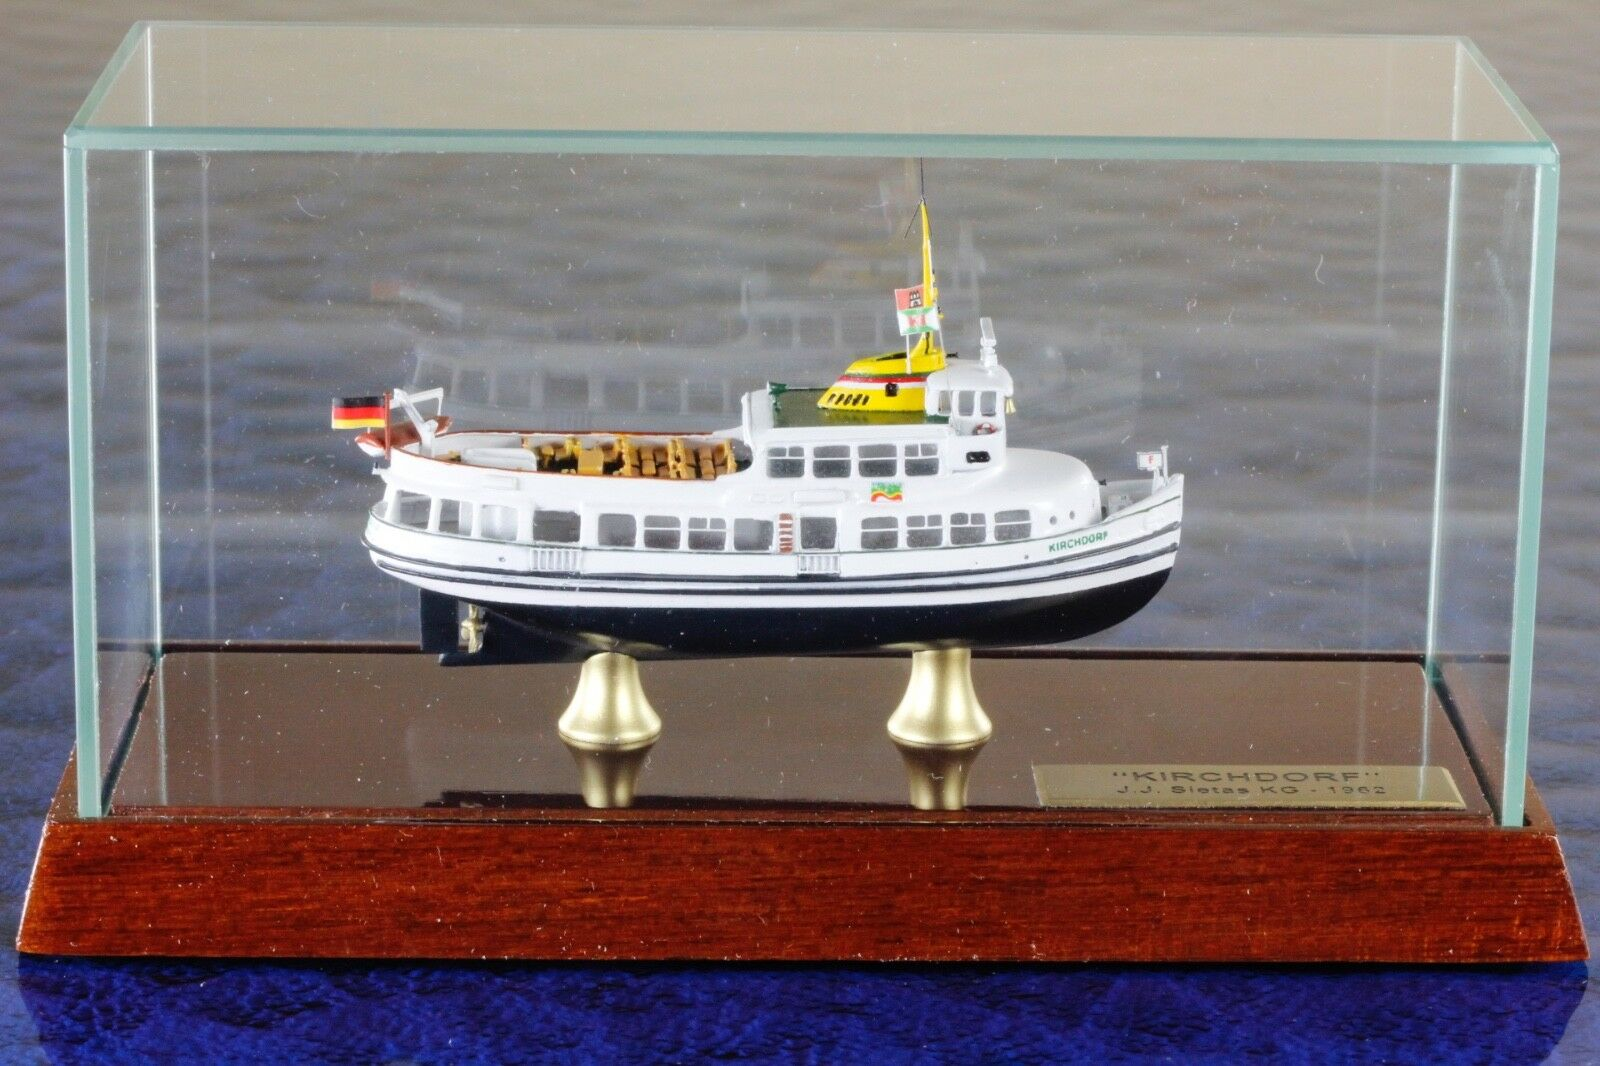 precios bajos todos los dias Kirchdorf fabricante Classic ship Collection 4158vr, 1 400 1 1 1 1250 barco modelo  genuina alta calidad